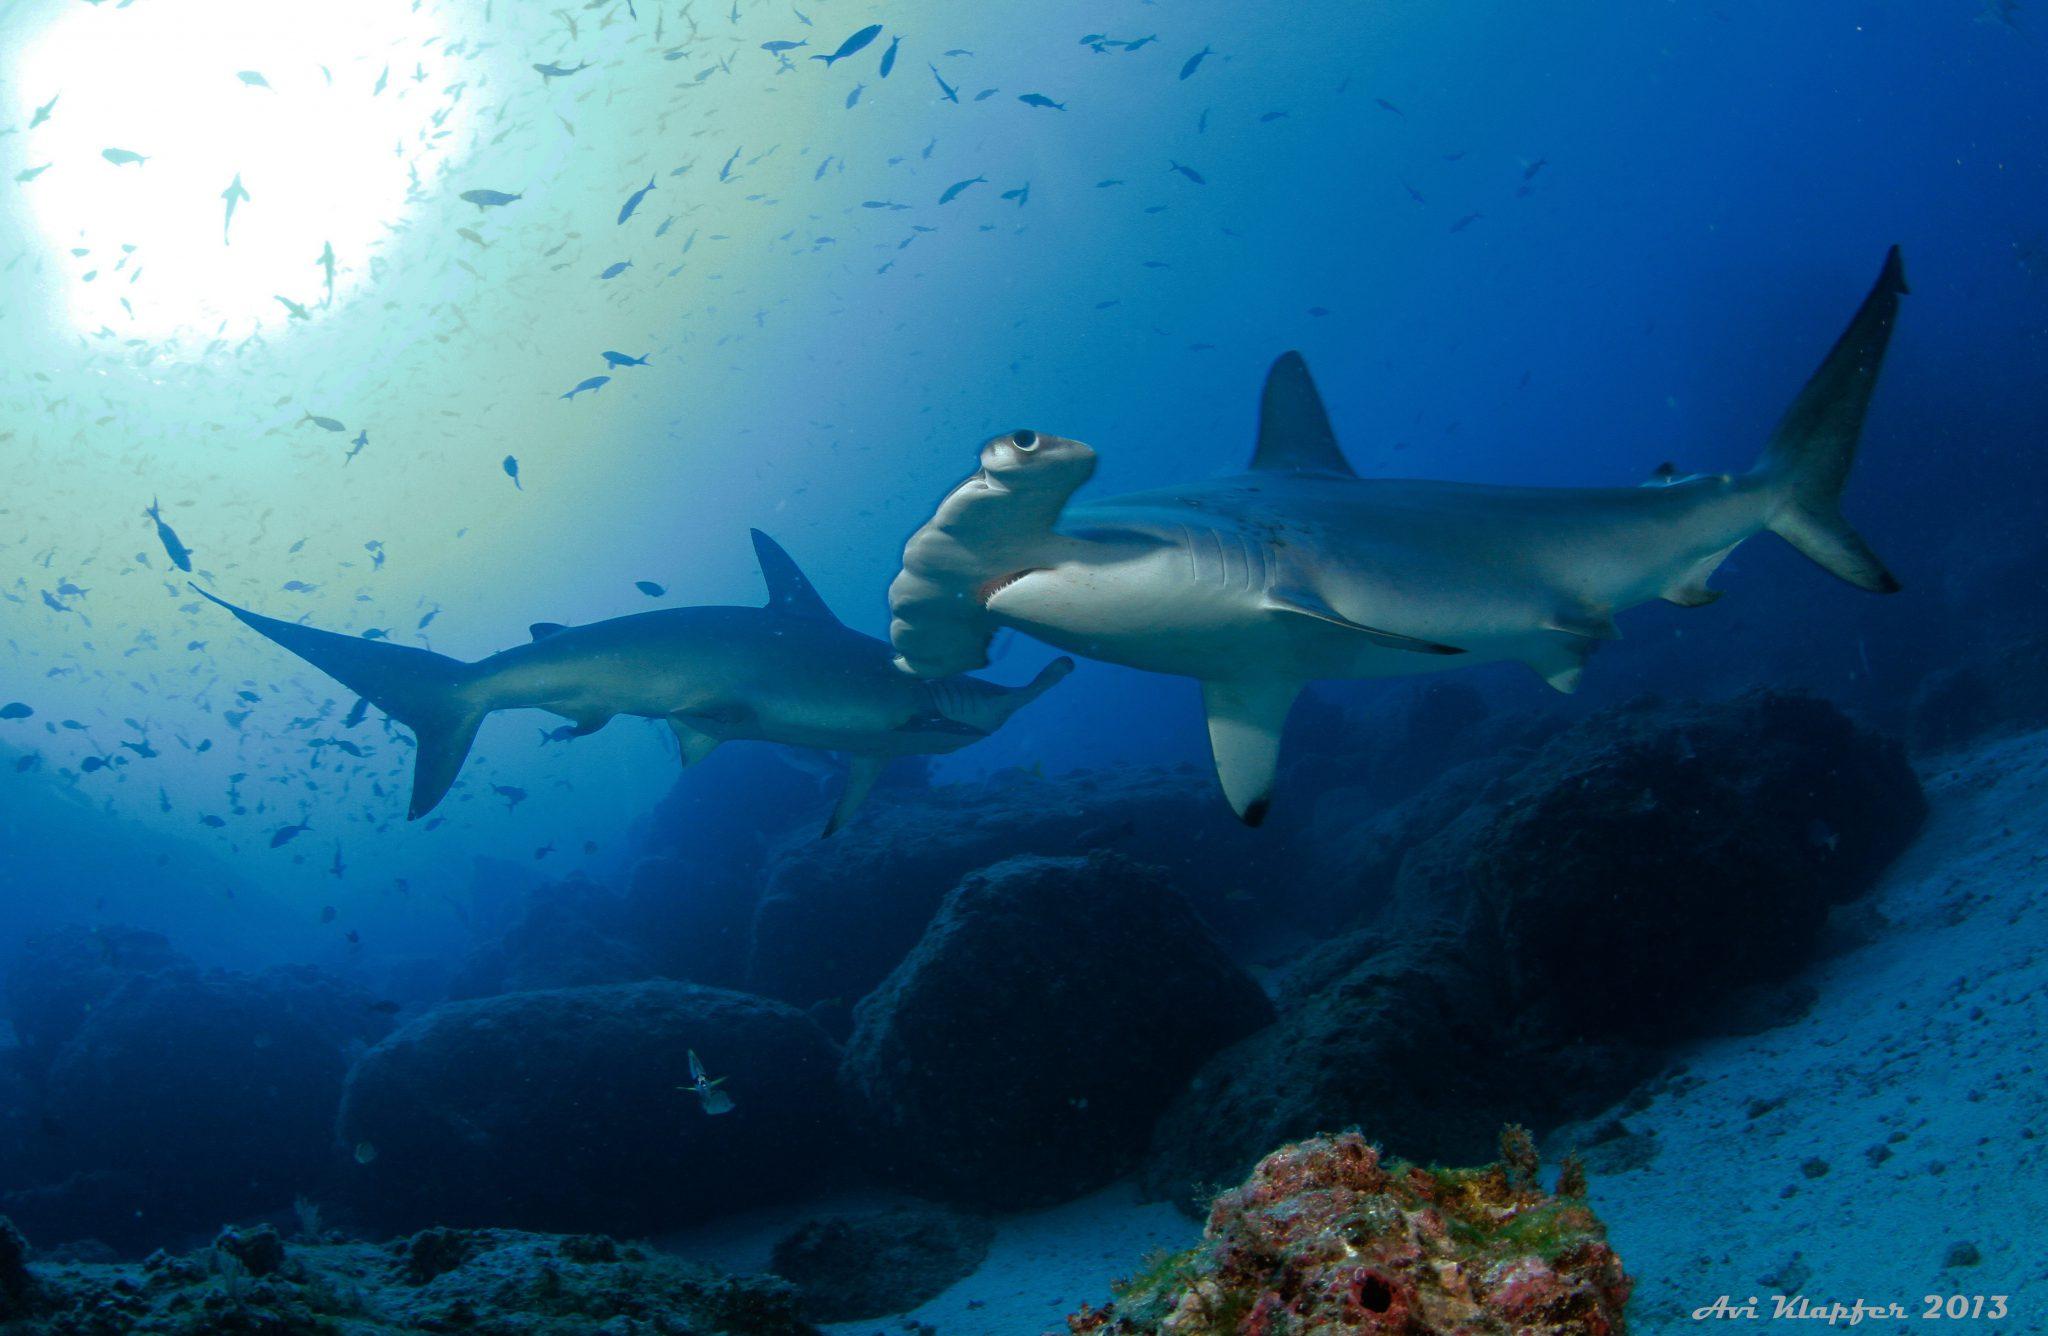 Undersea Hunter Group 2154 - Underseahunter Group